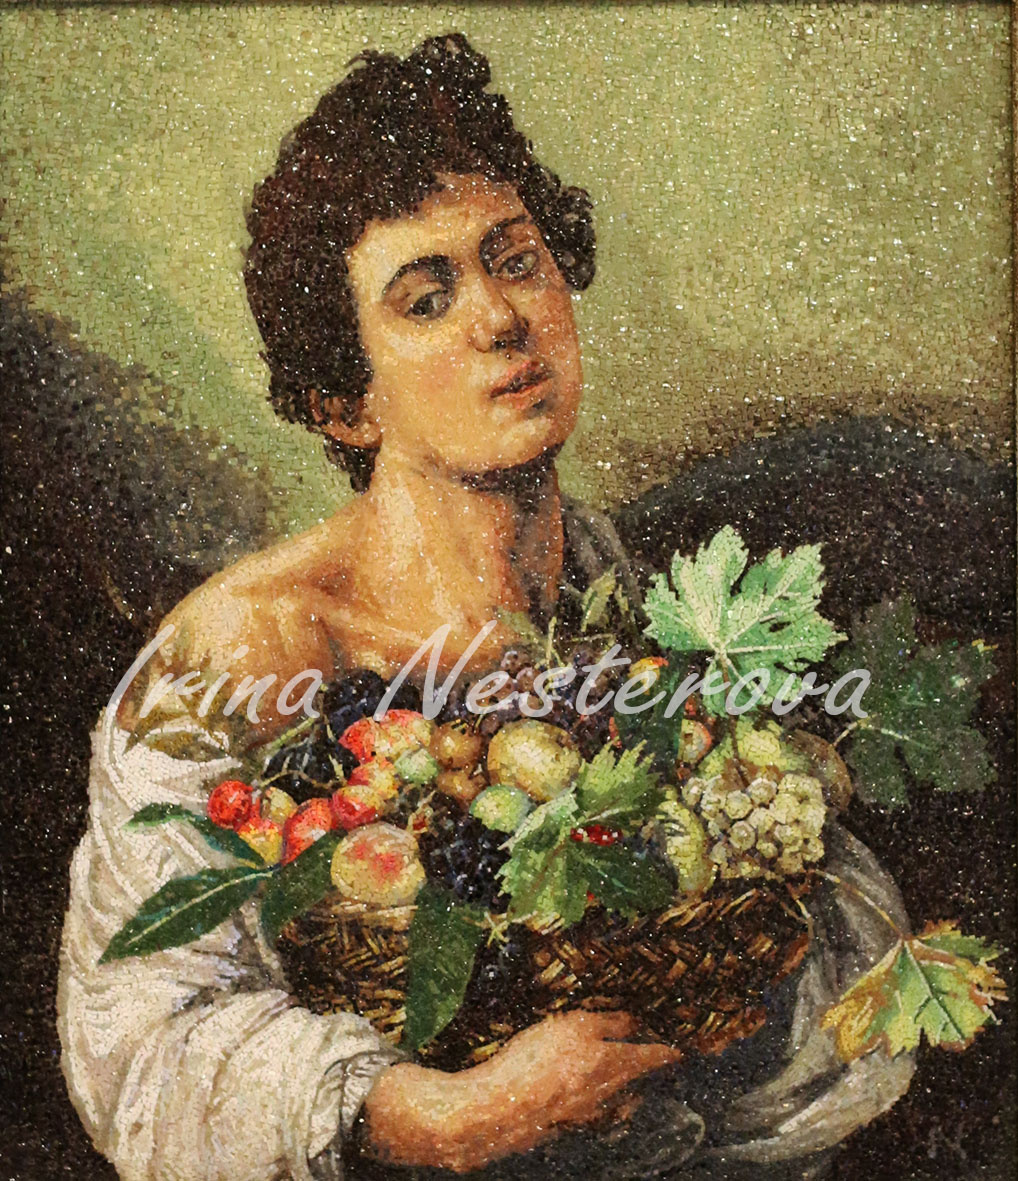 Irina Nesterova. Copy of Michelangelo de Caravaggio's painting Boy with Fruit